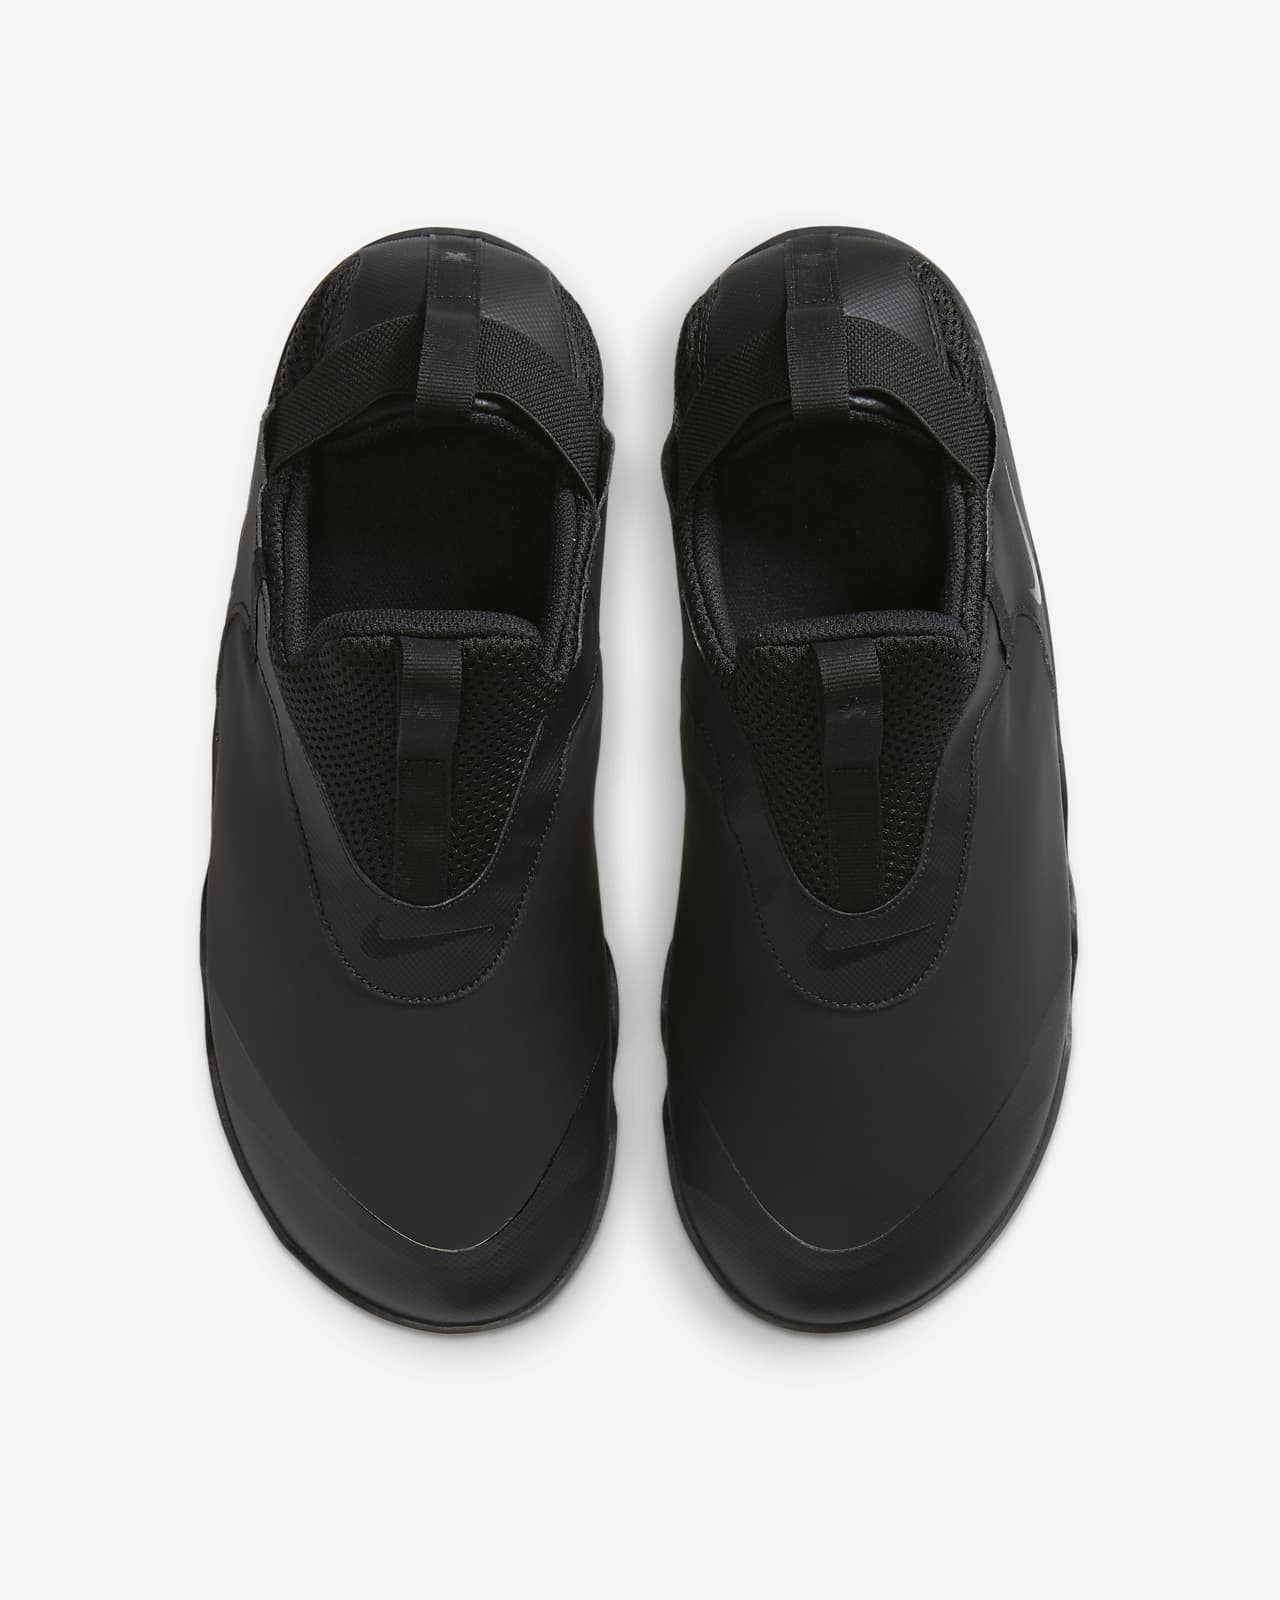 Nike Air Zoom Pulse Shoes. Nike LU